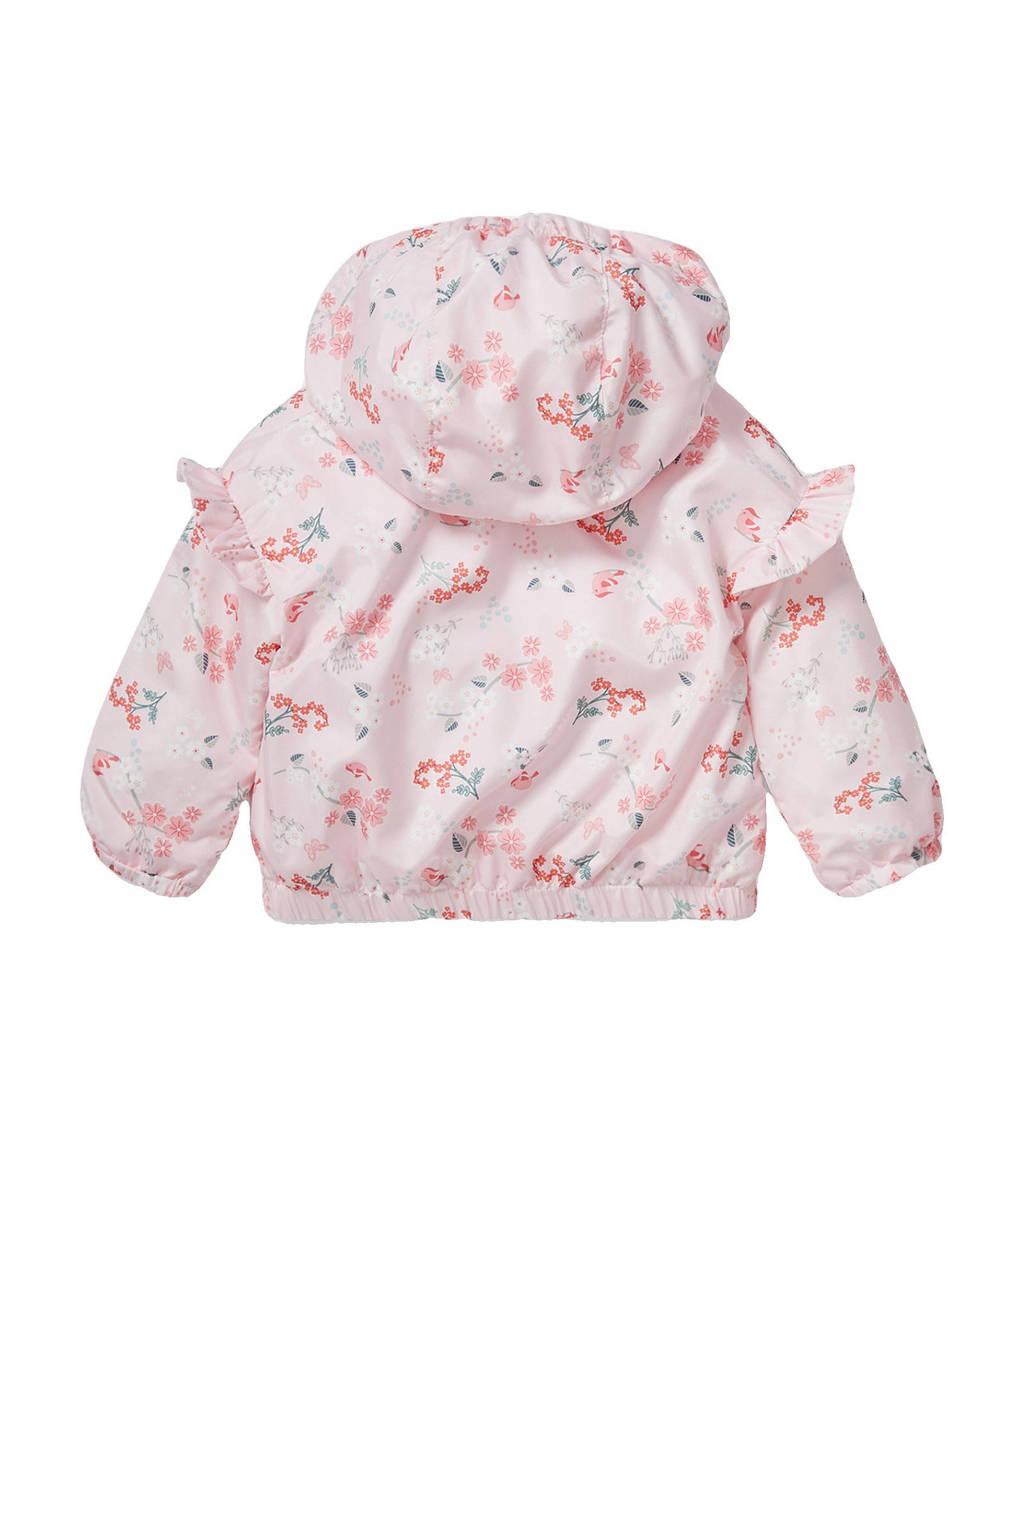 C&A Baby Club gebloemde  zomerjas roze, Roze